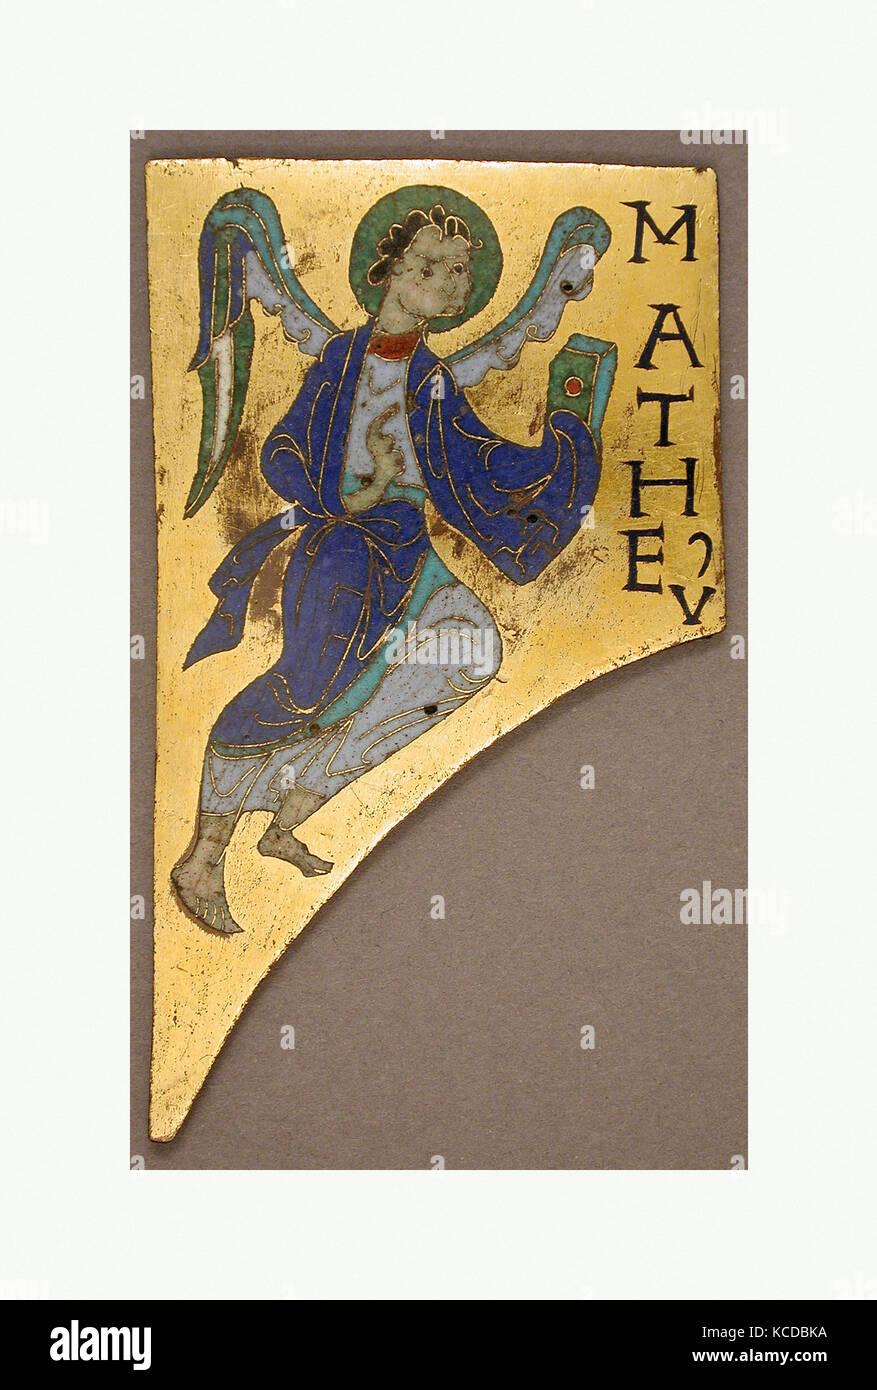 Plaque with the symbol of the evangelist matthew ca 1100 stock plaque with the symbol of the evangelist matthew ca 1100 biocorpaavc